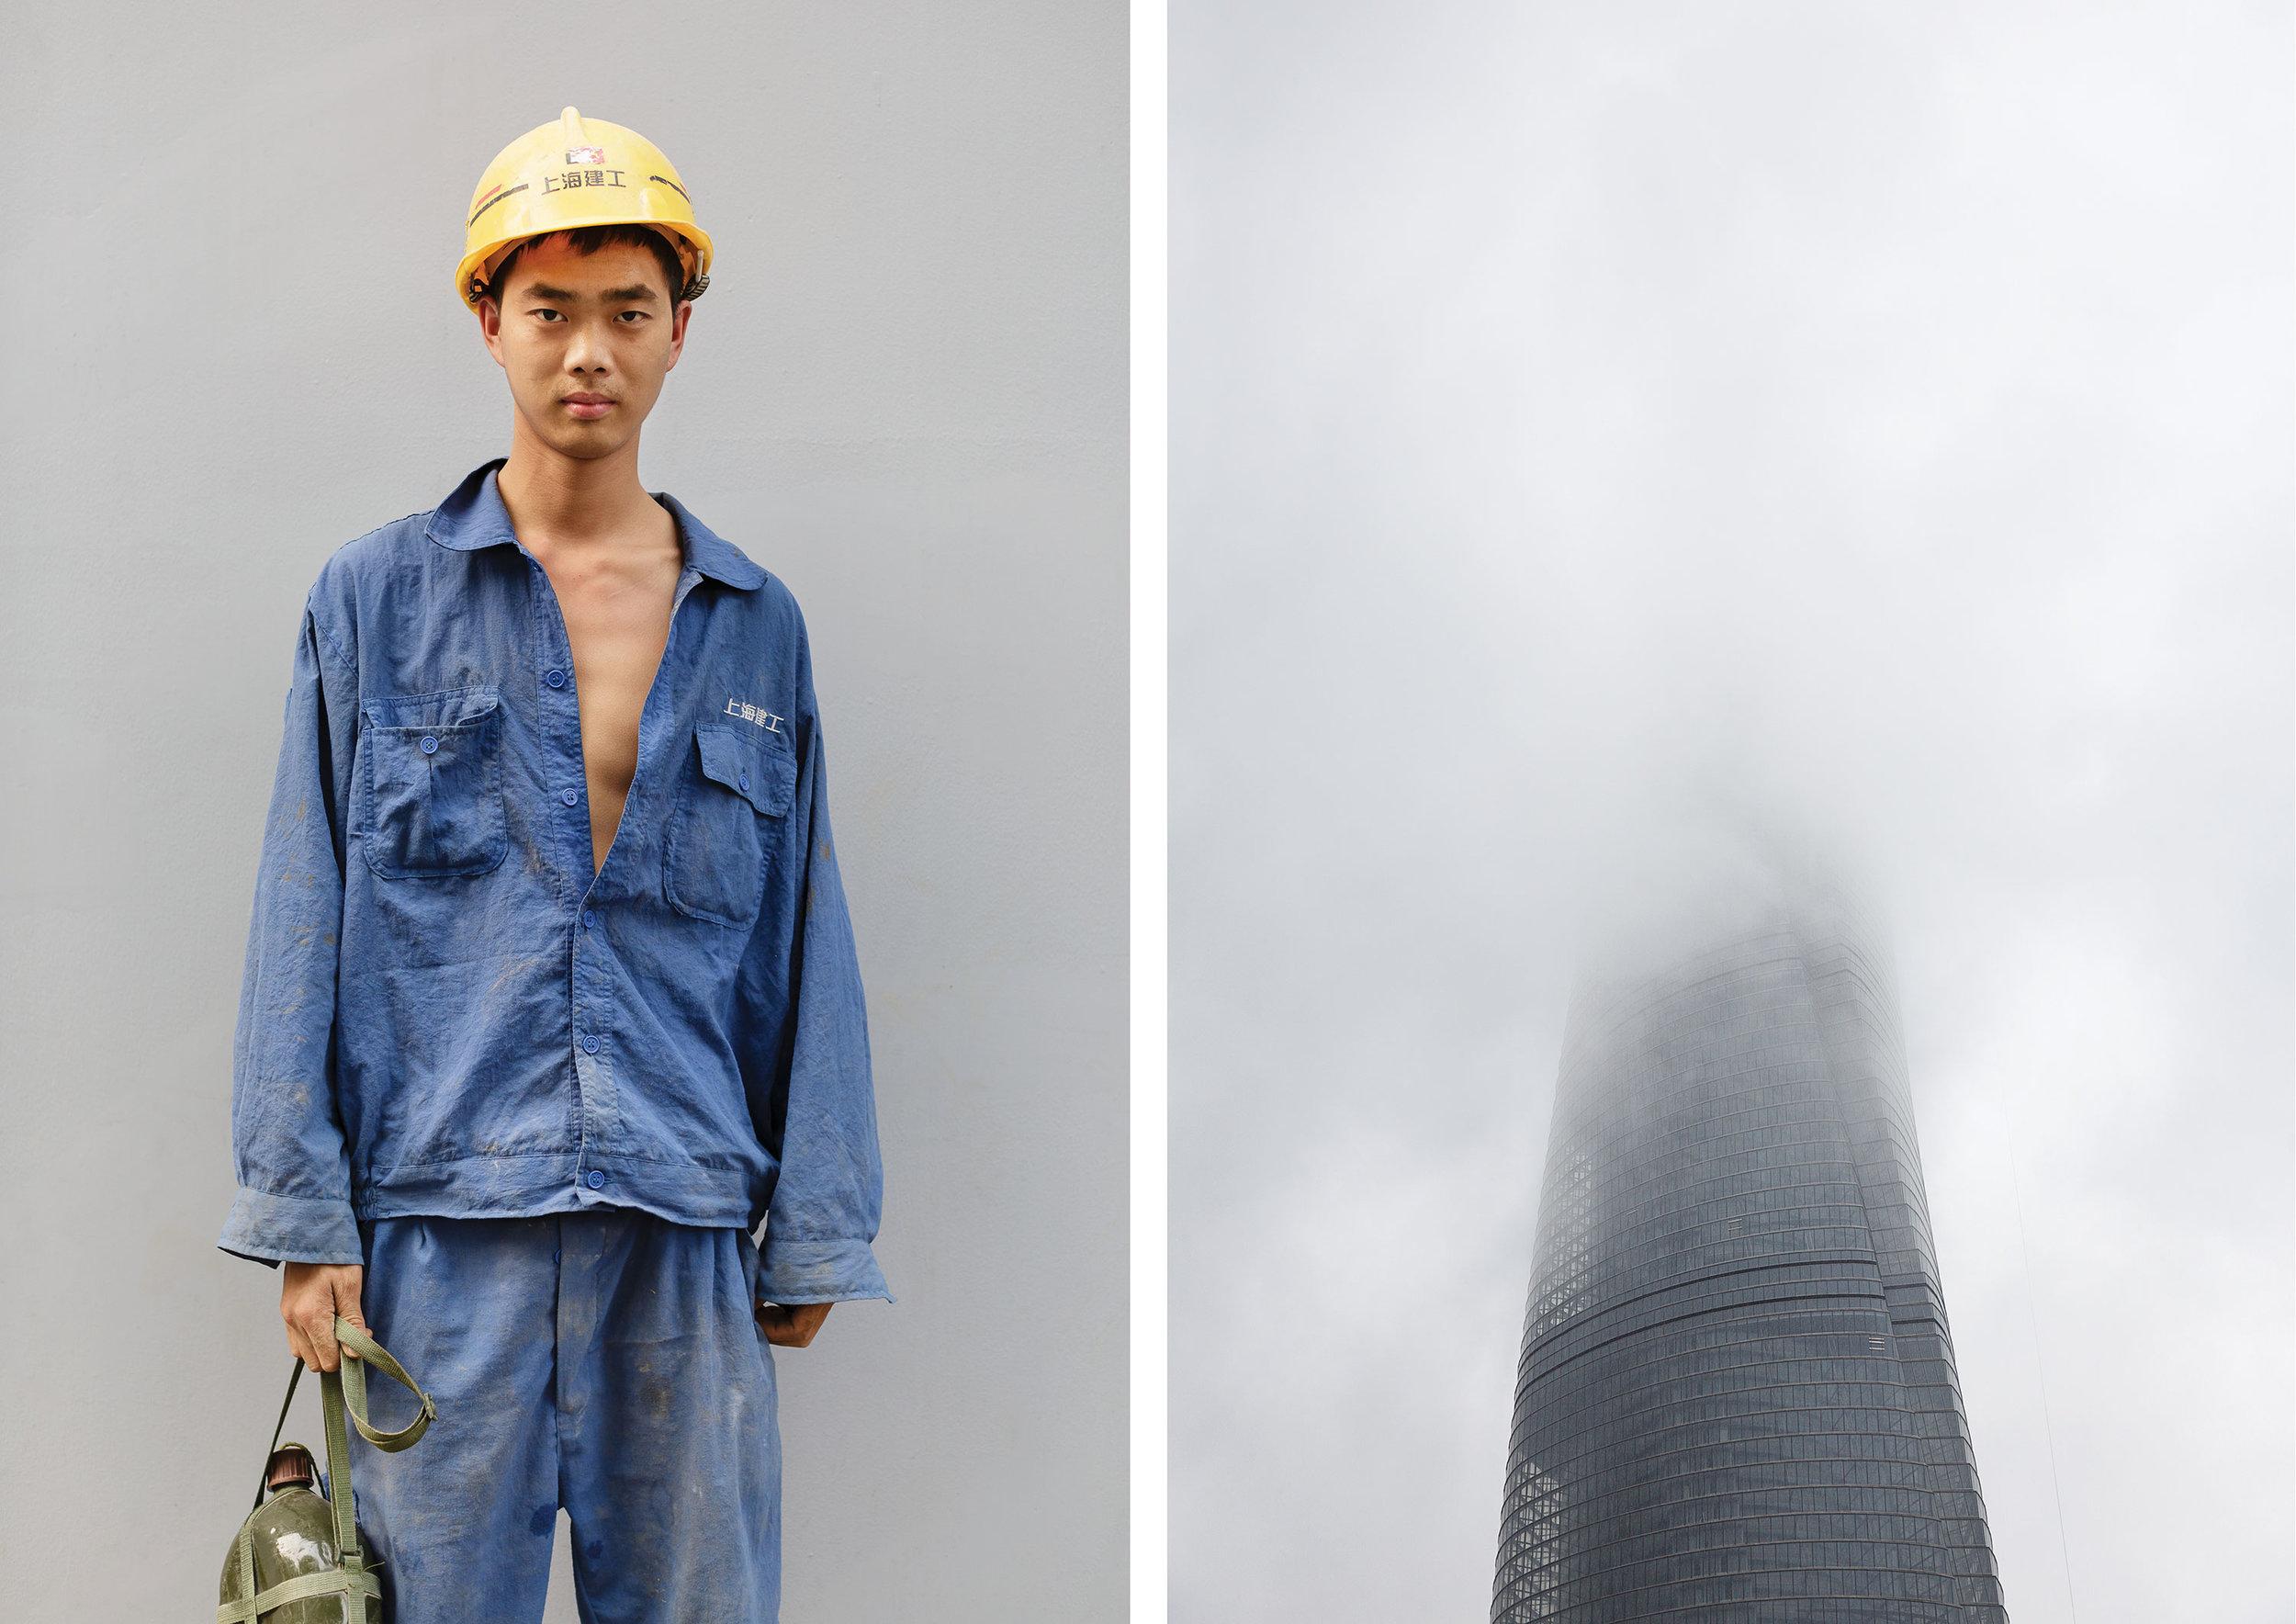 Shanghai_Tower-workers-and-building13.jpg